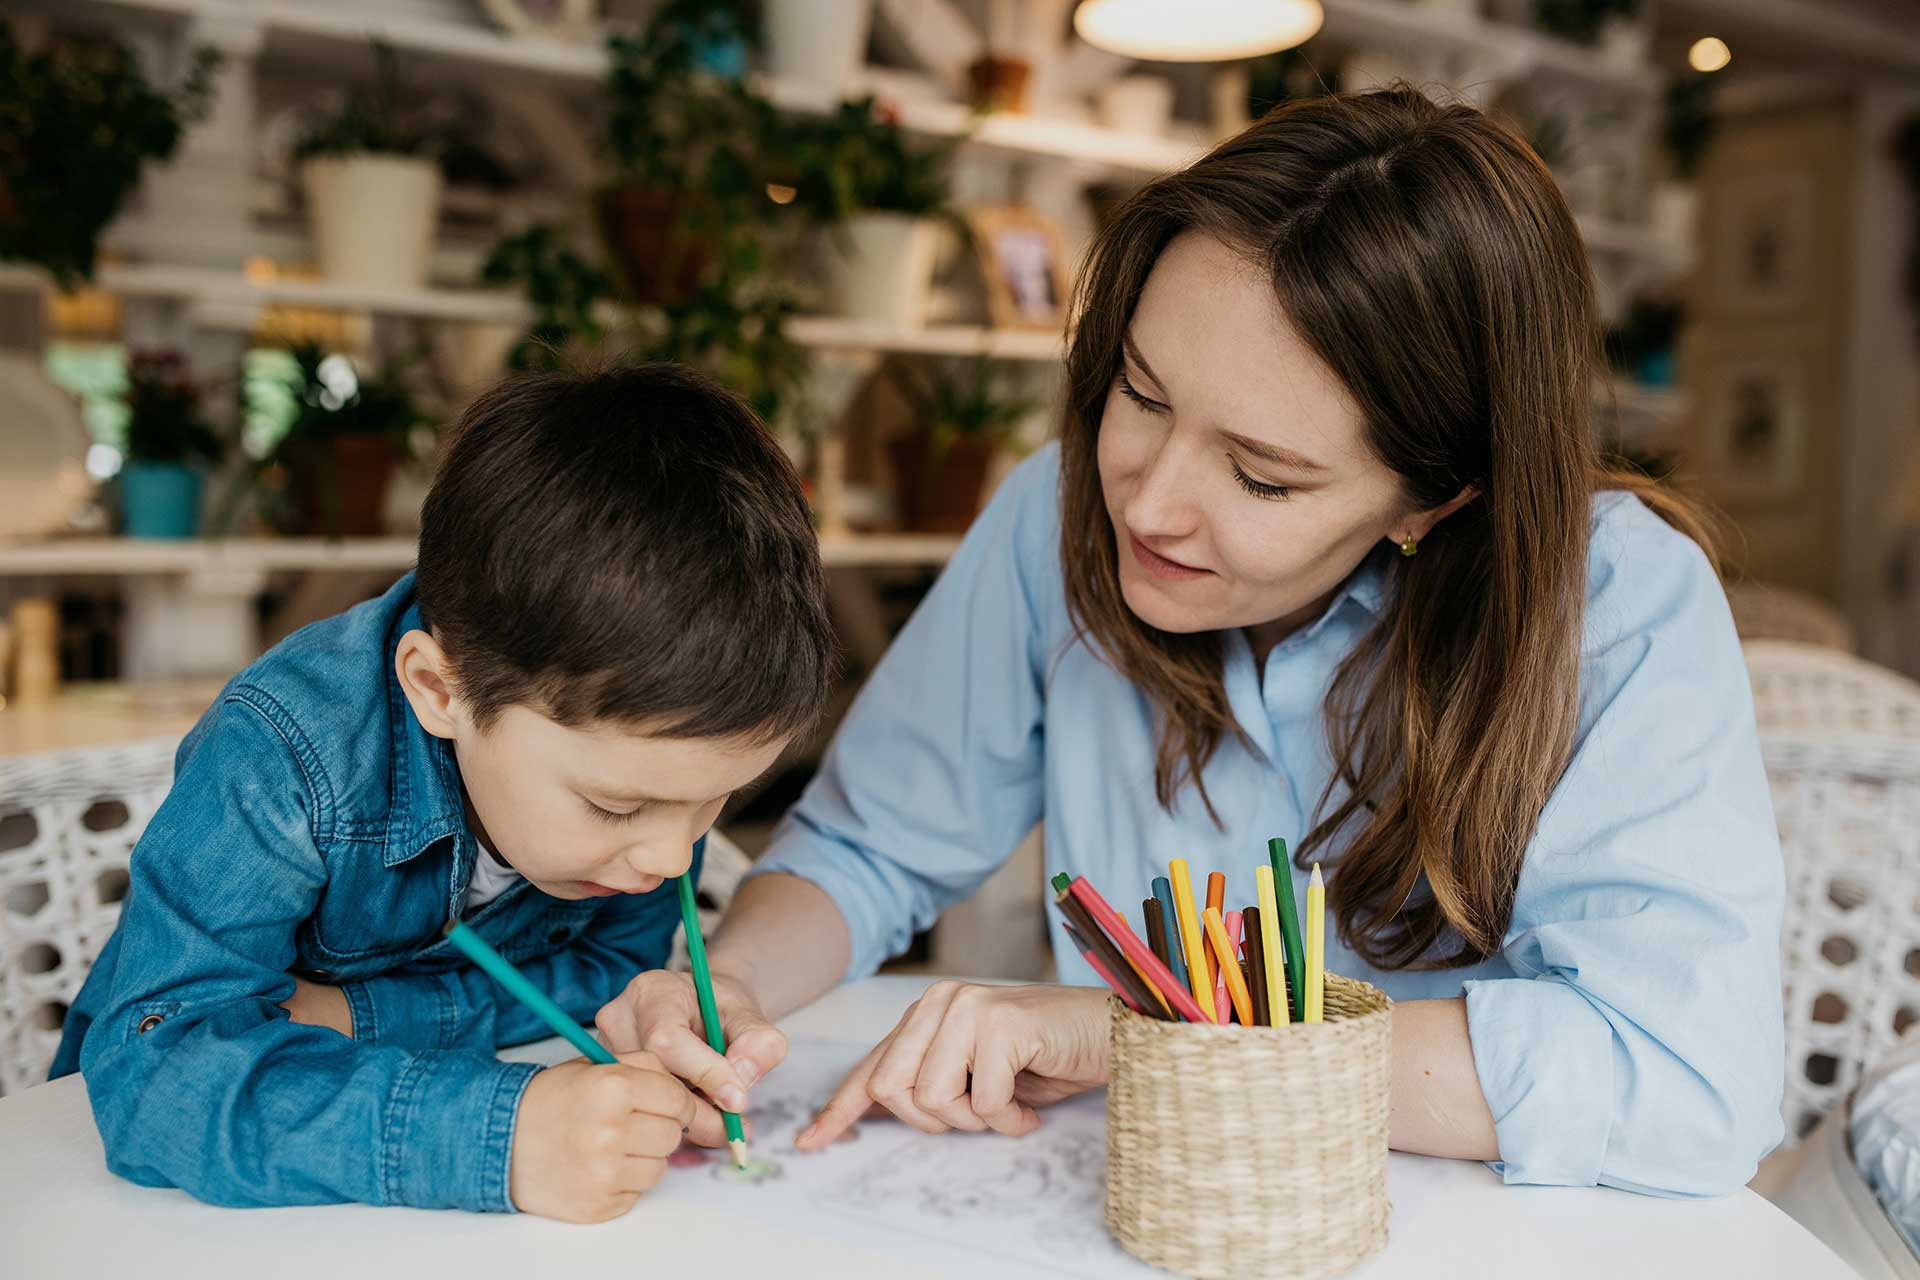 Maintaining-parental-authority